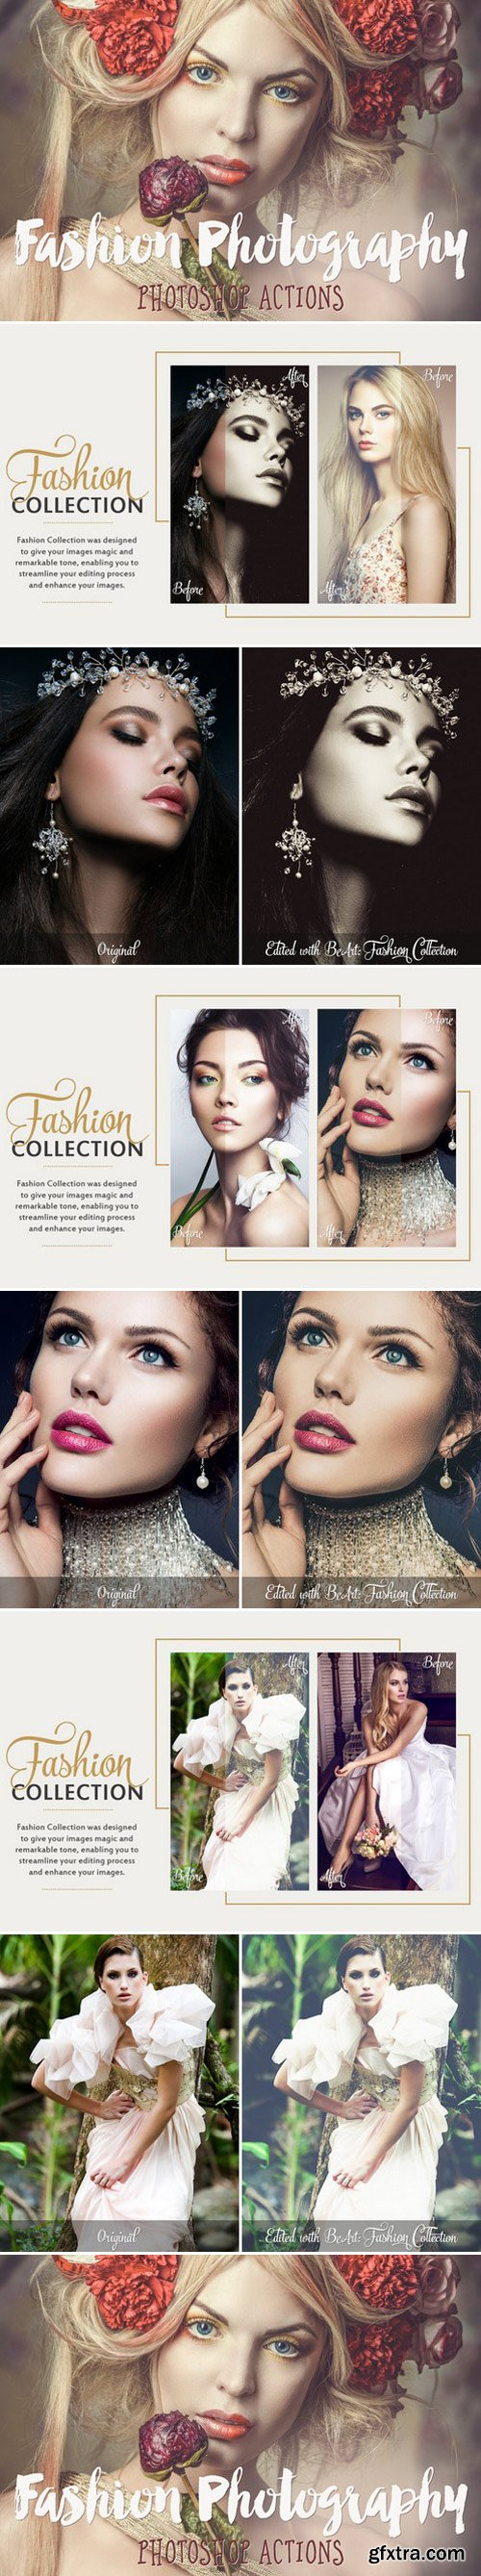 CM - Fashion Photography Photoshop Action 434468